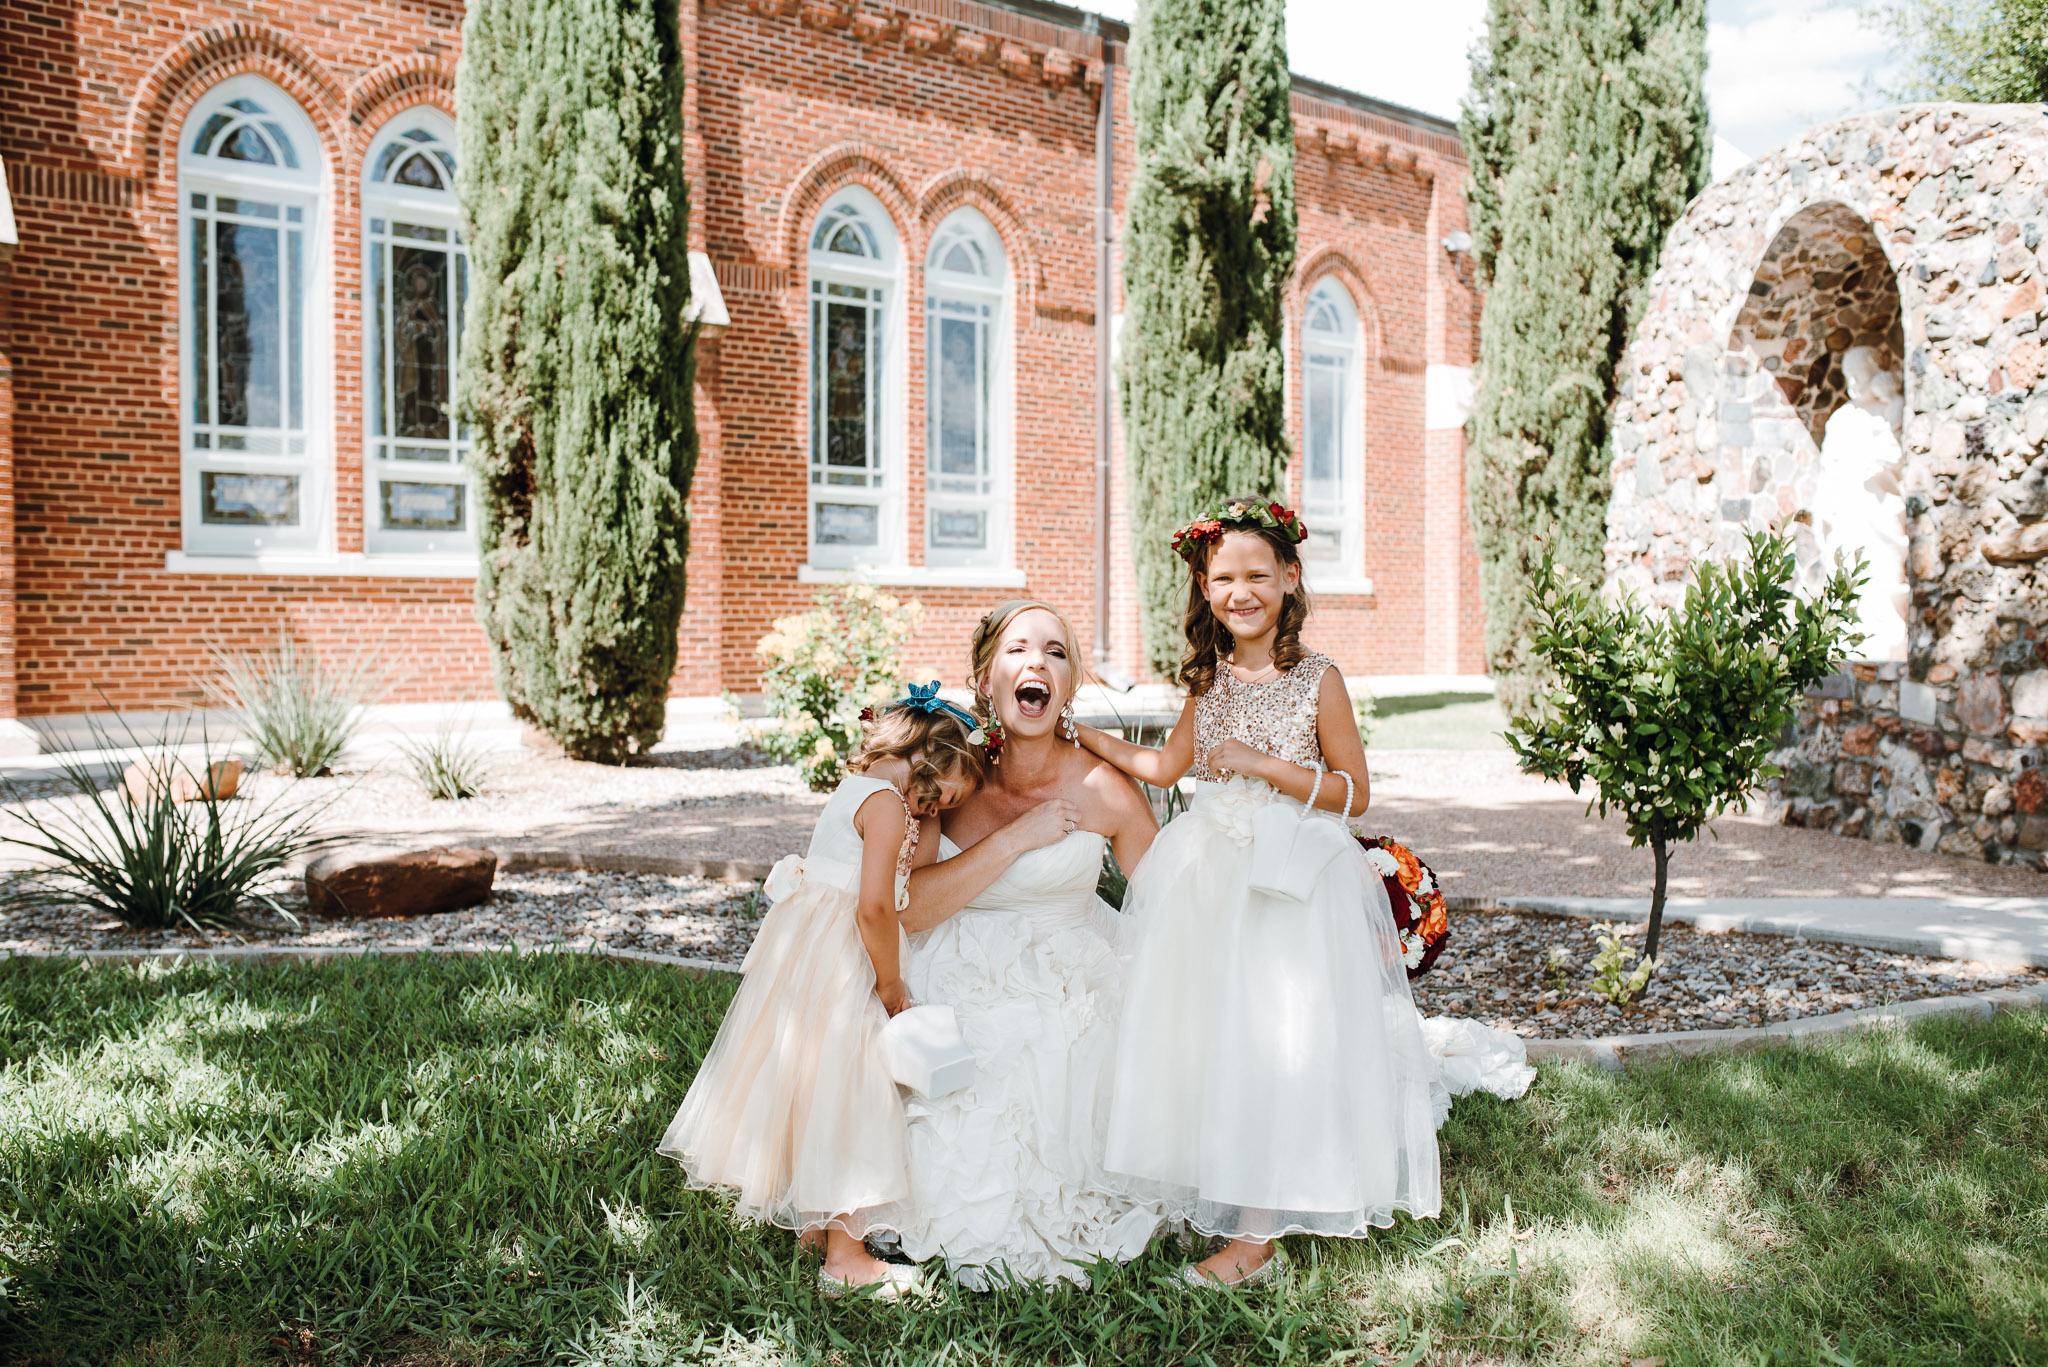 Rowena-West-Texas-Wedding-Photographer-Gillian&Ryan-0017.jpg